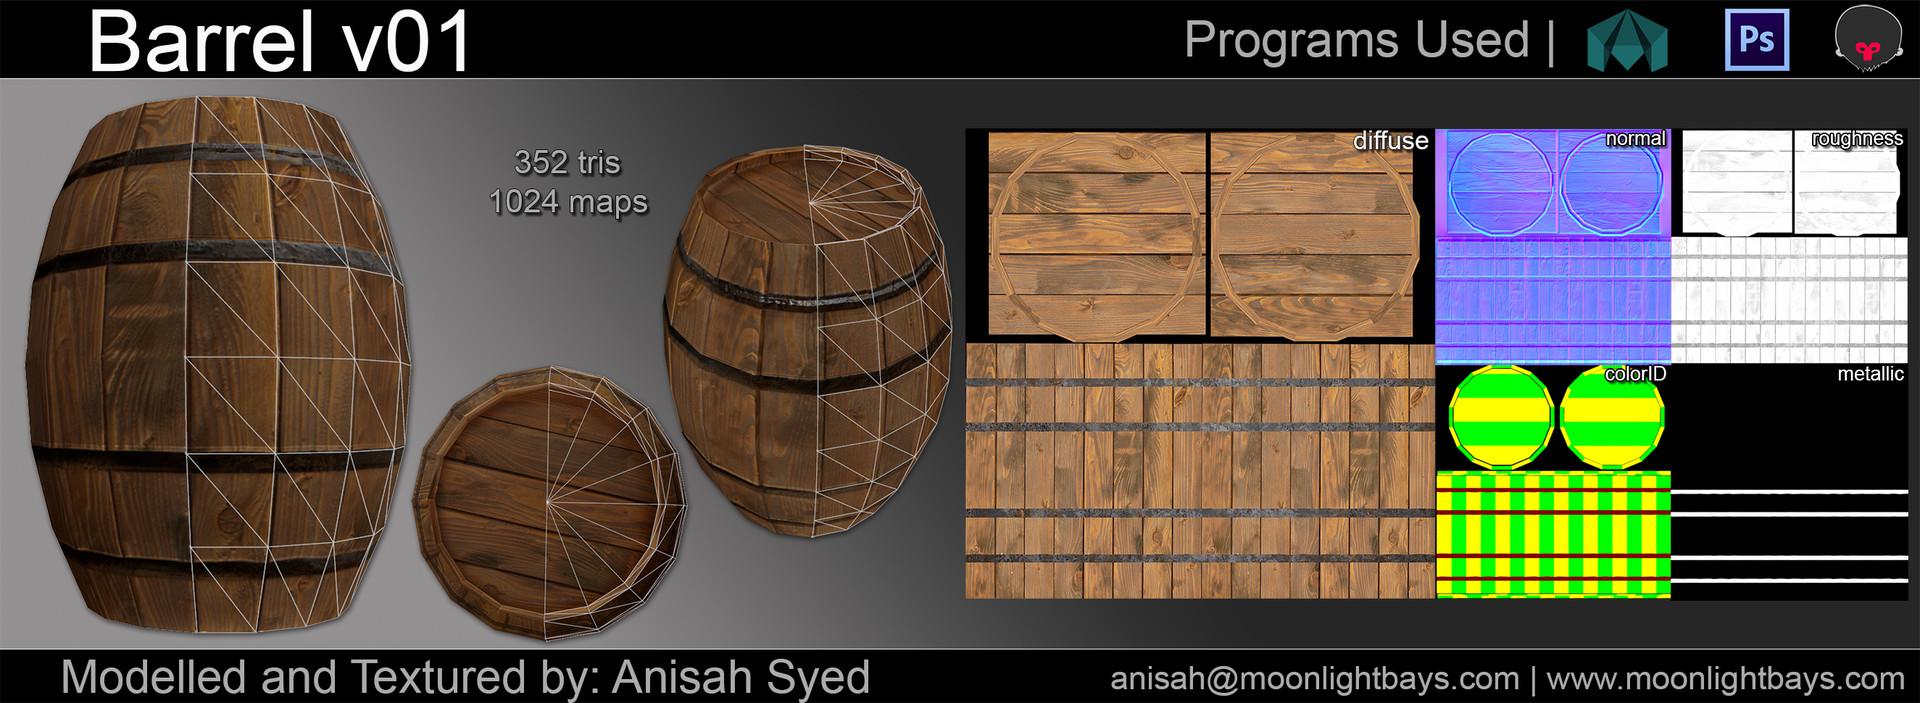 Anisah syed barrelpresentation